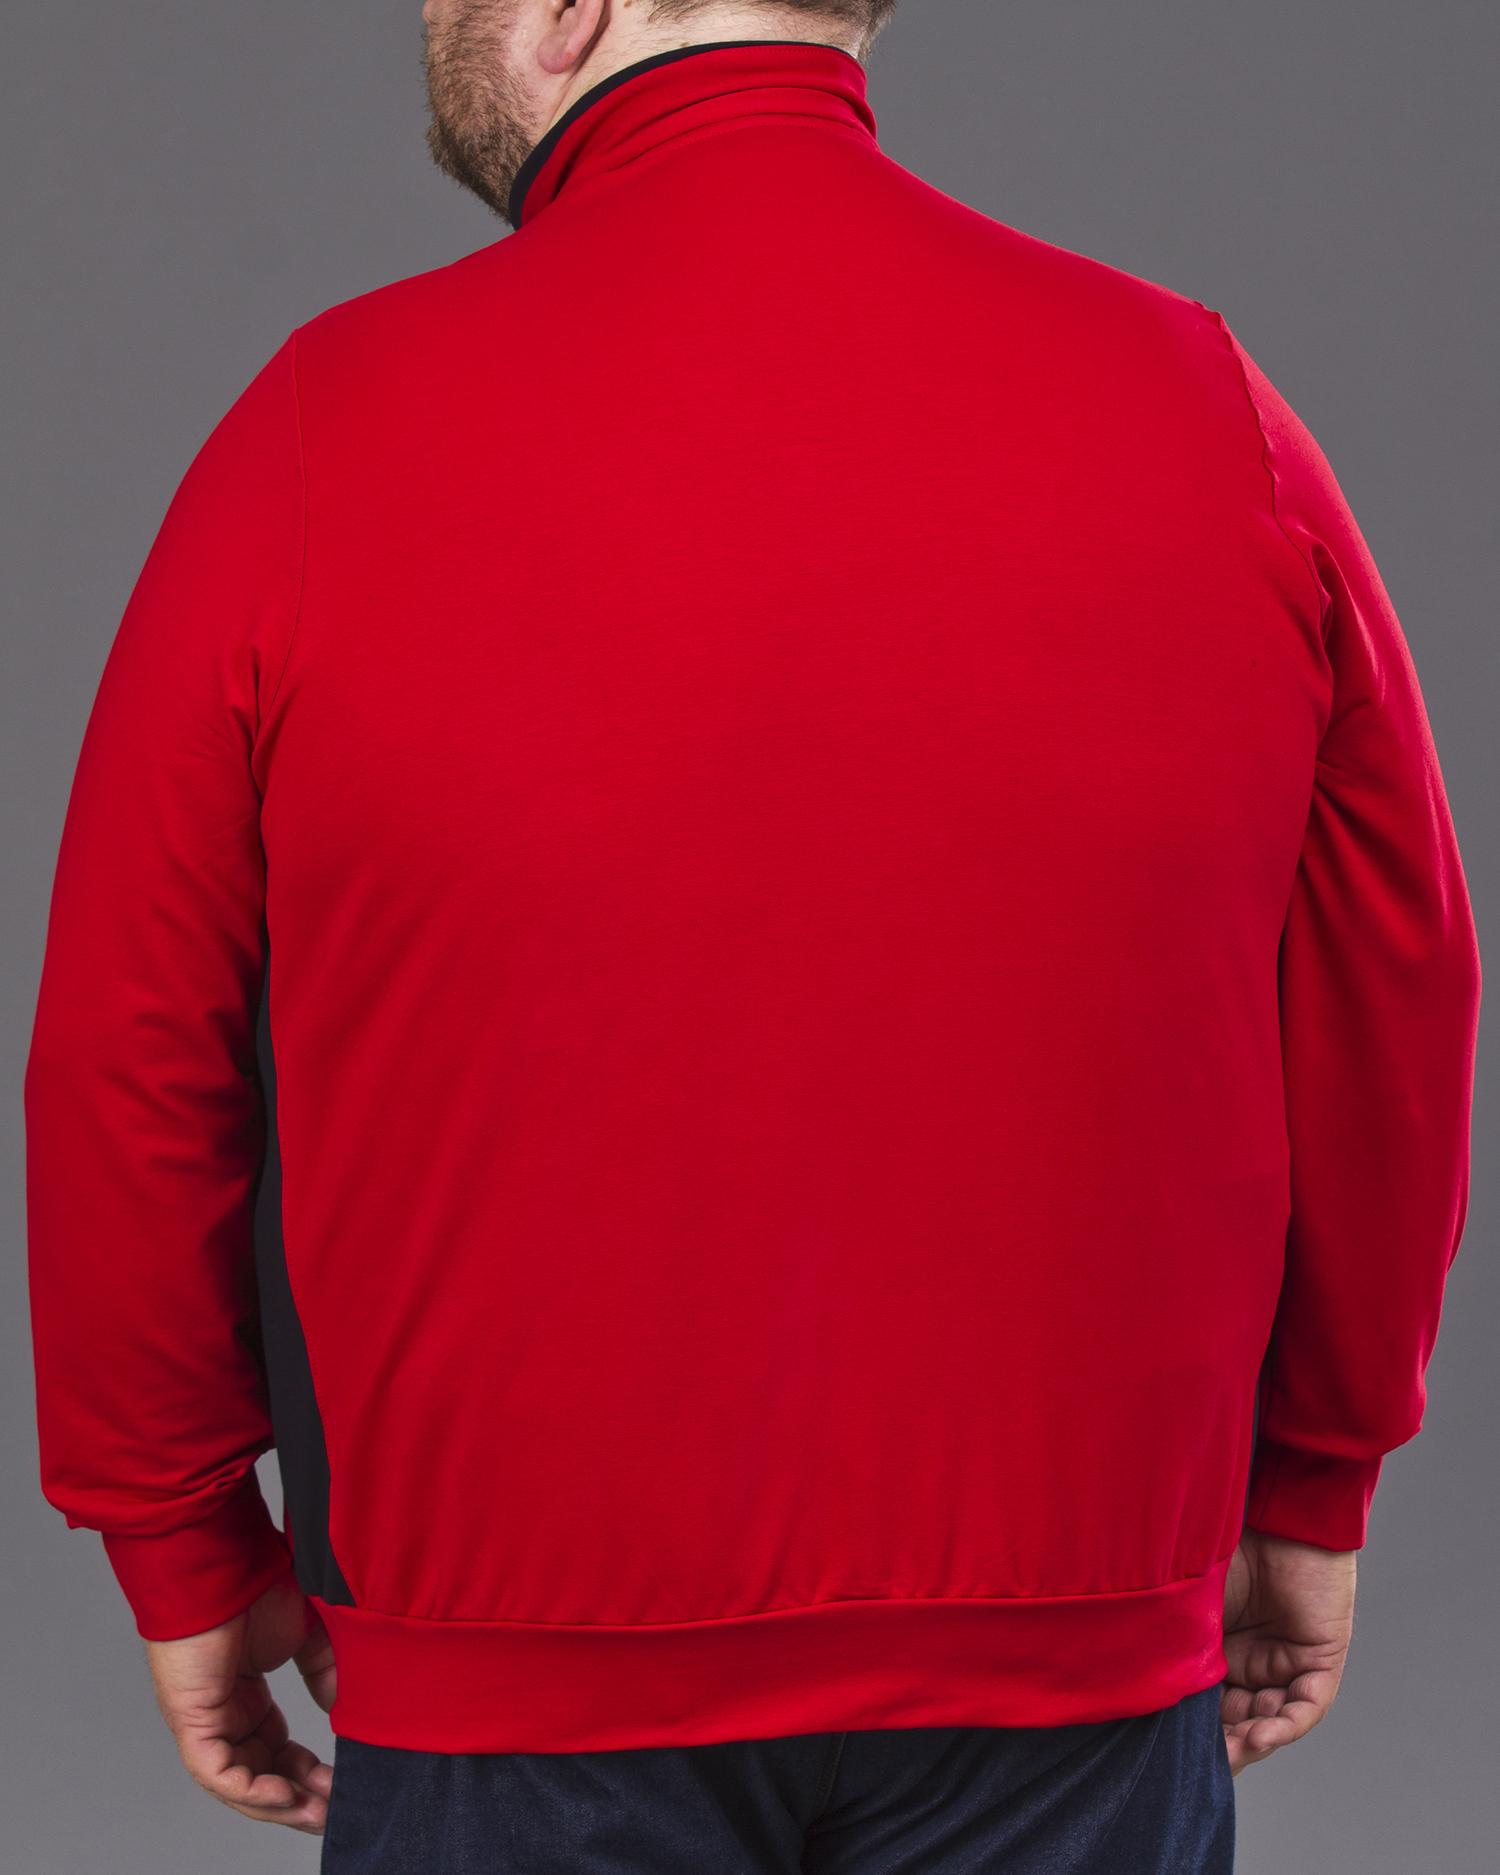 Big Men Certified bluza 3XL 4XL 5XL 6XL 7XL 8XL